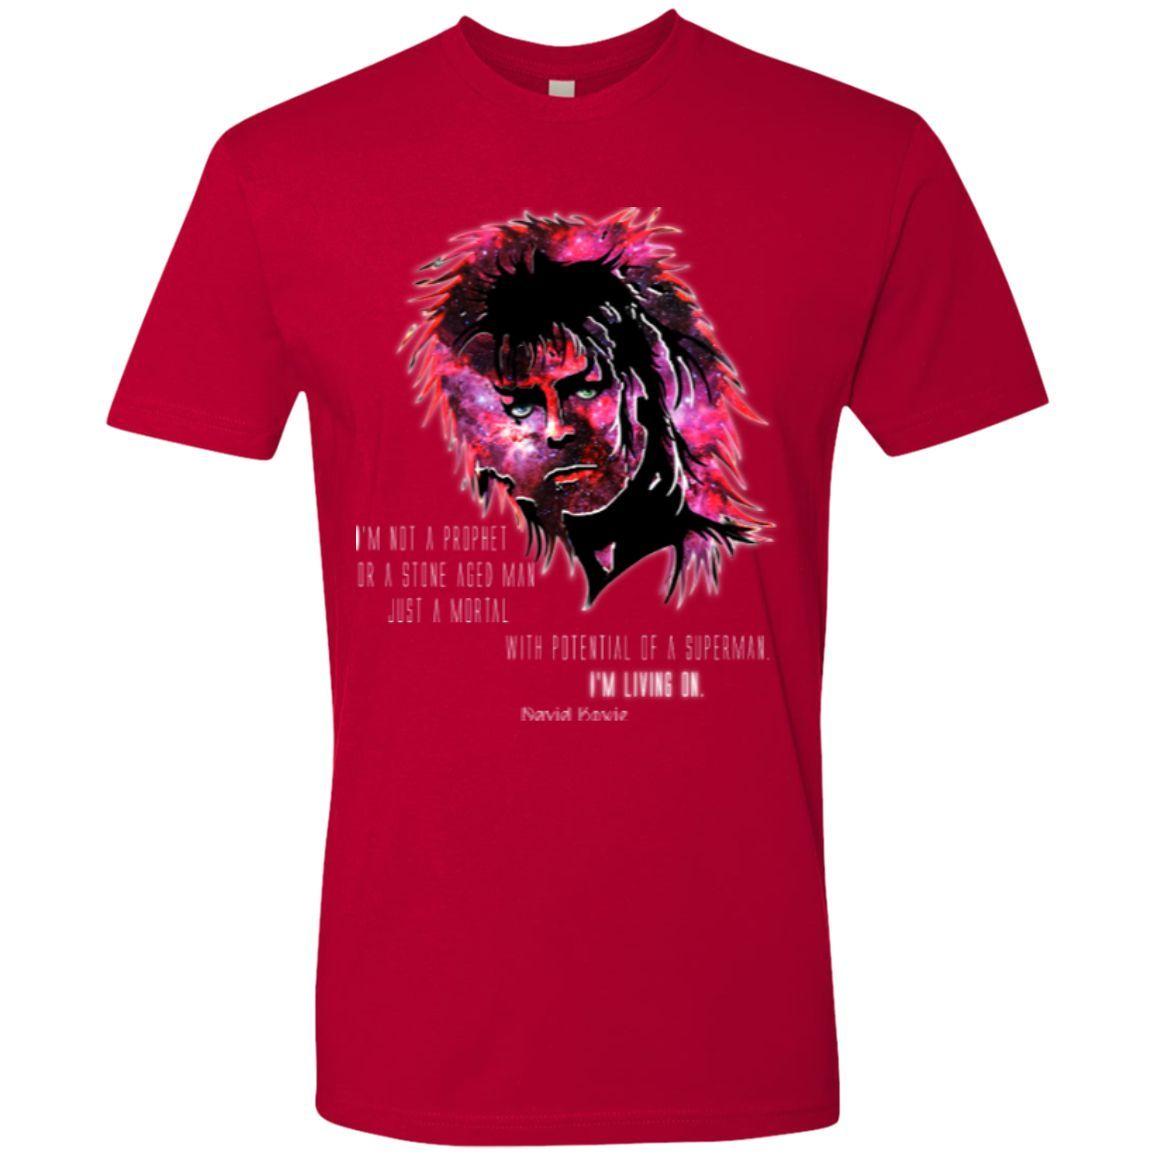 David Bowie - I'm Living On - Next Level Premium Short Sleeve Tee